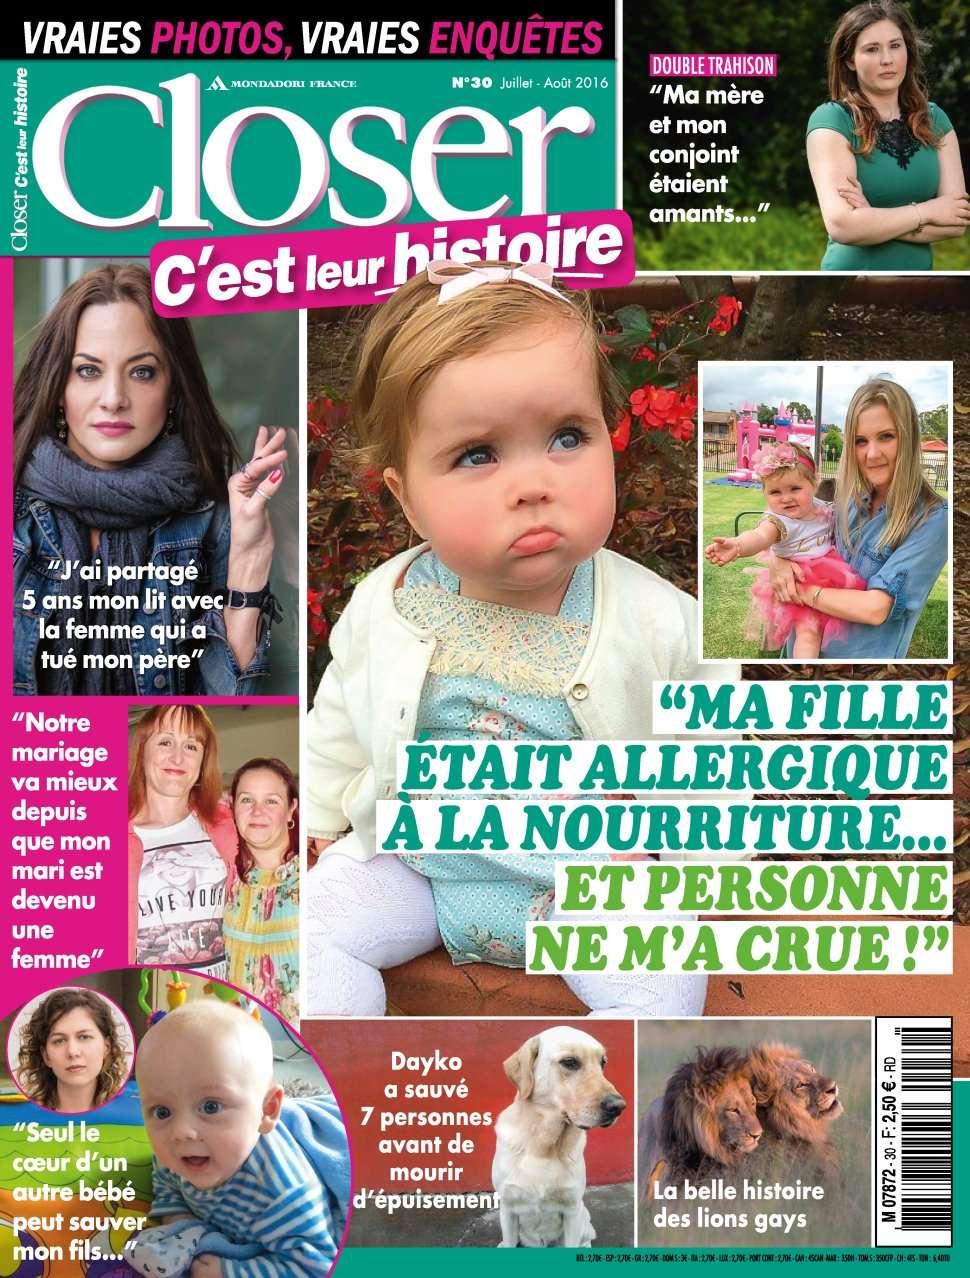 Closer Real Life 30 - Juillet/Aout 2016